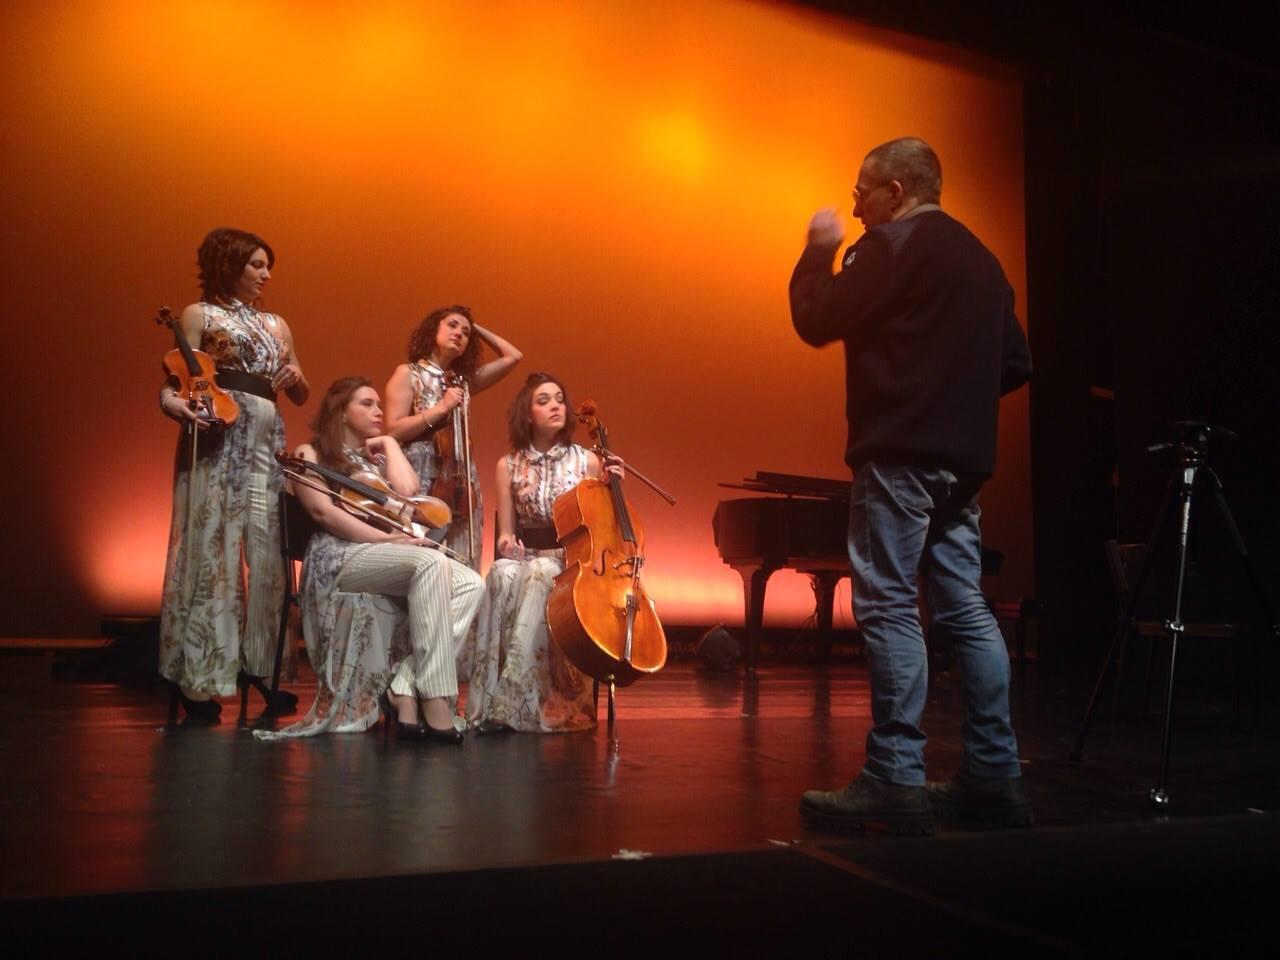 Sul set..con Enrico Bruno photographer!